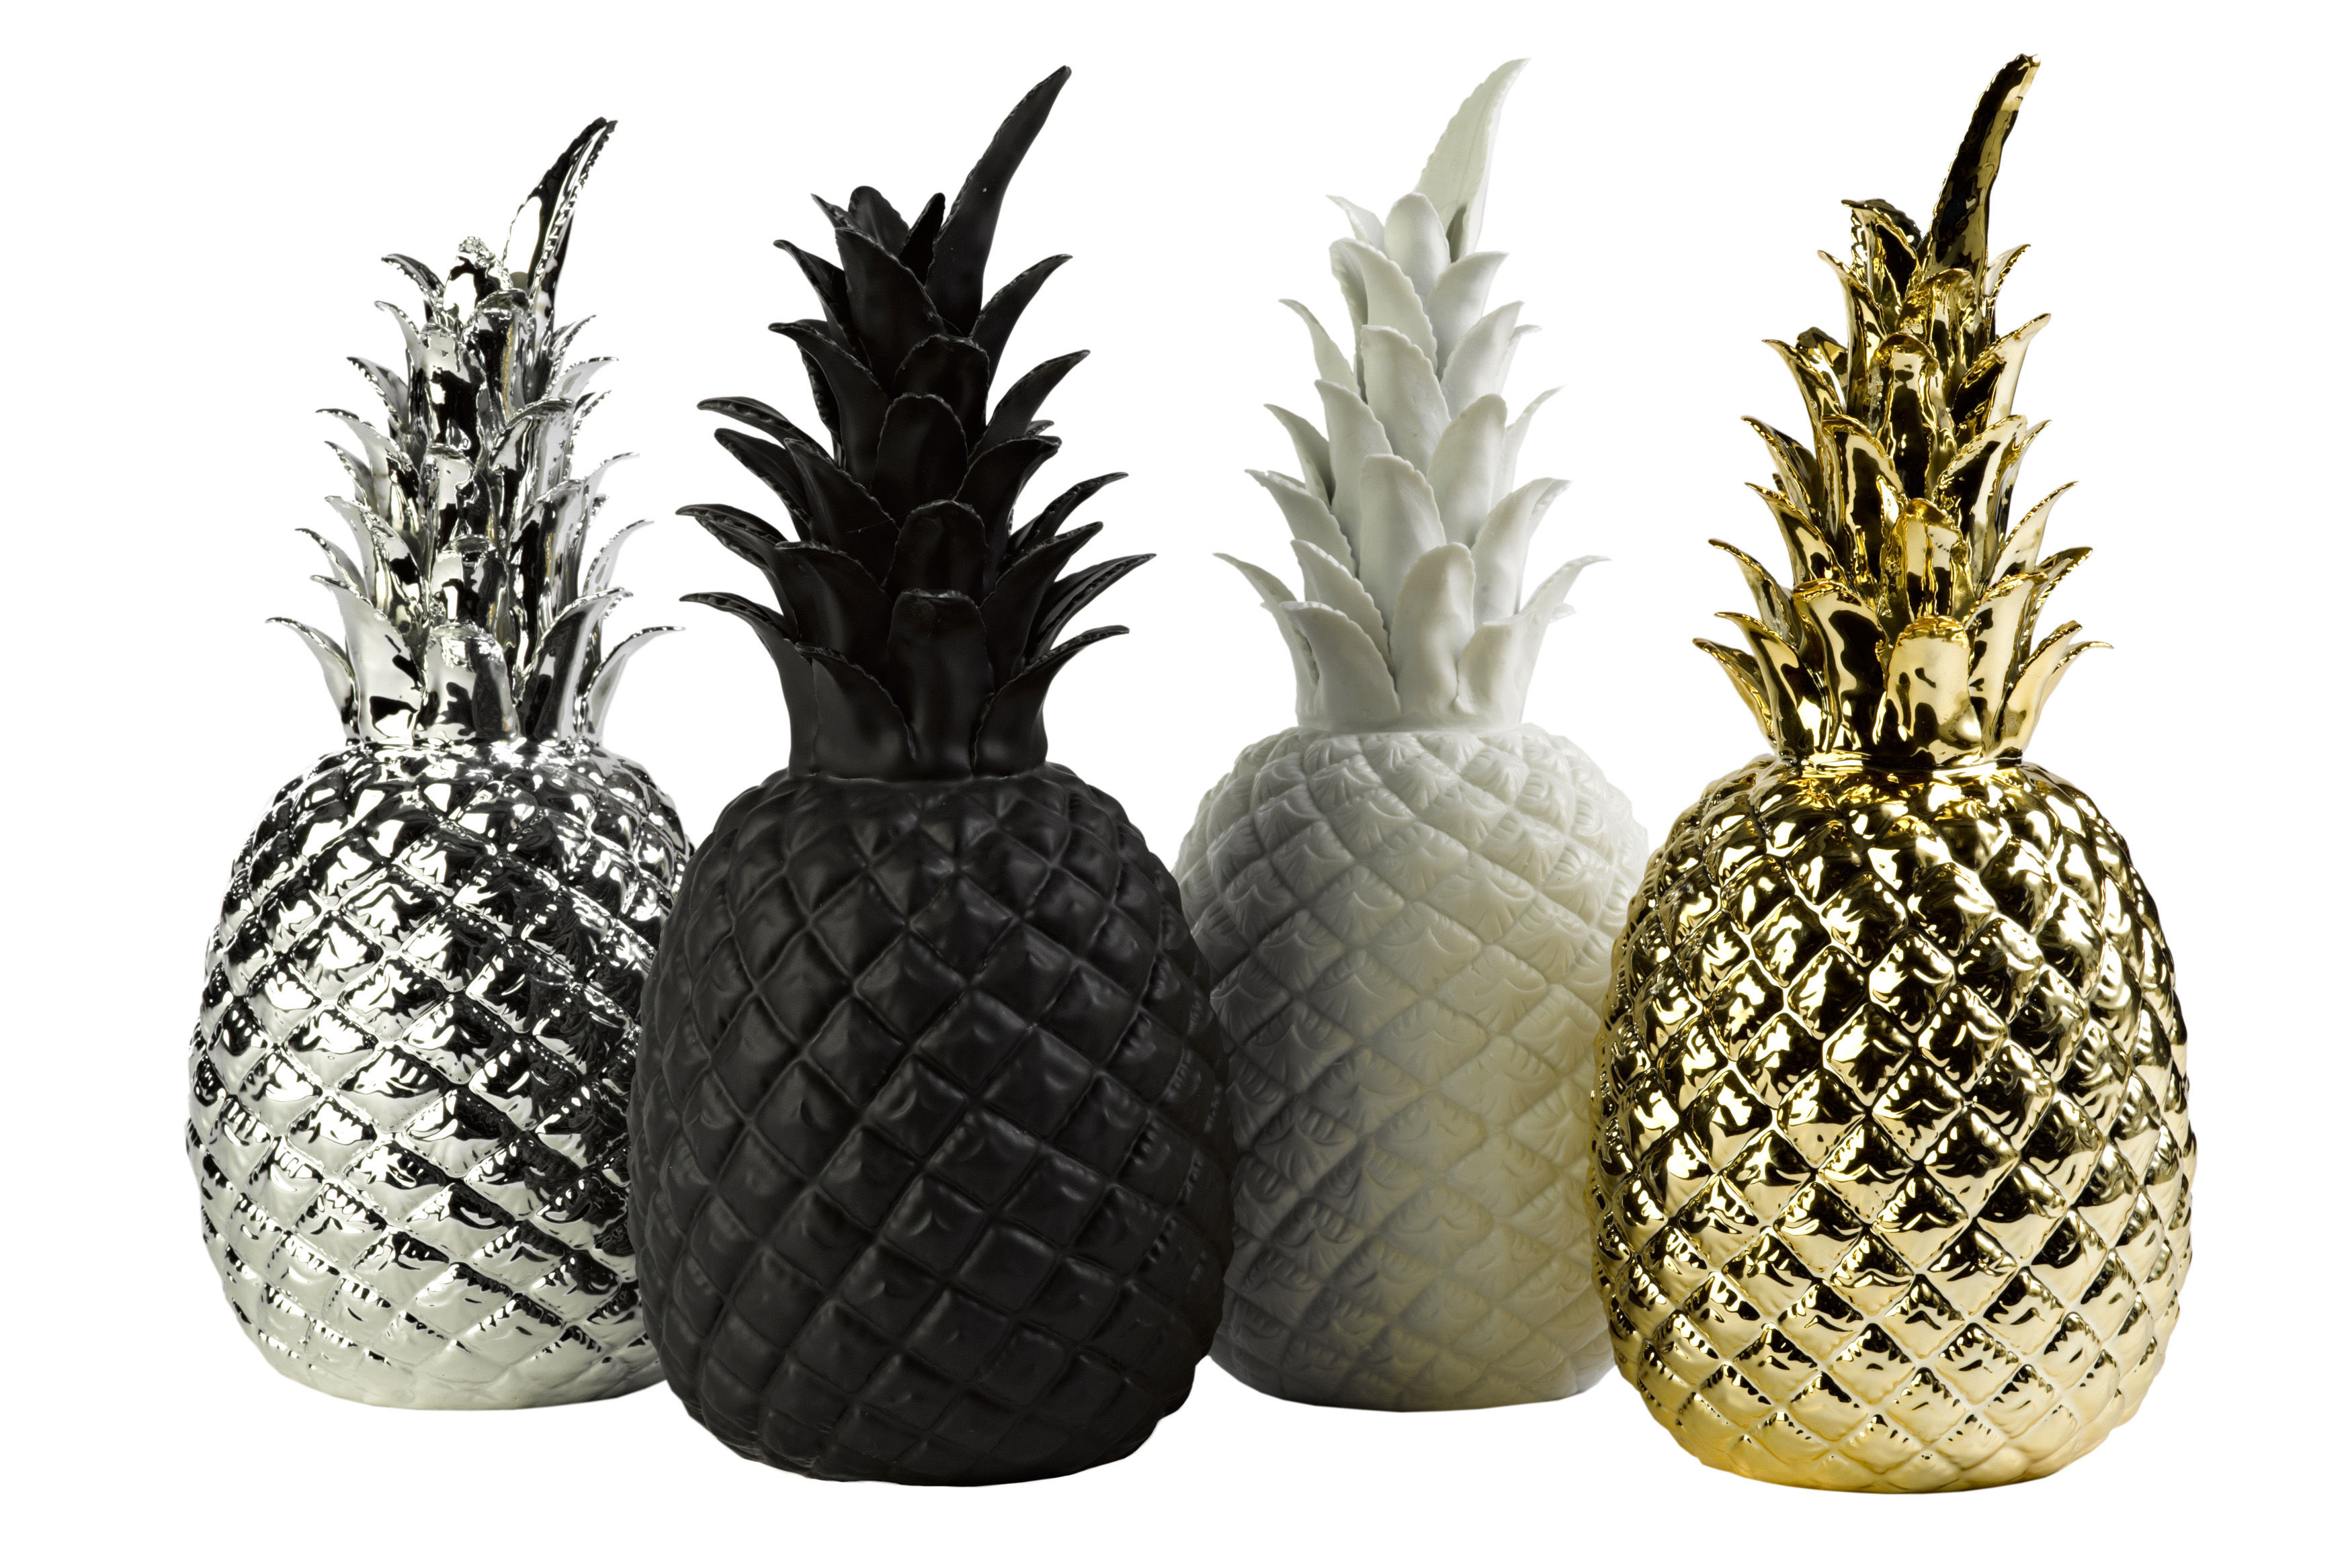 d coration pineapple small 14 x h 32 cm porcelaine. Black Bedroom Furniture Sets. Home Design Ideas